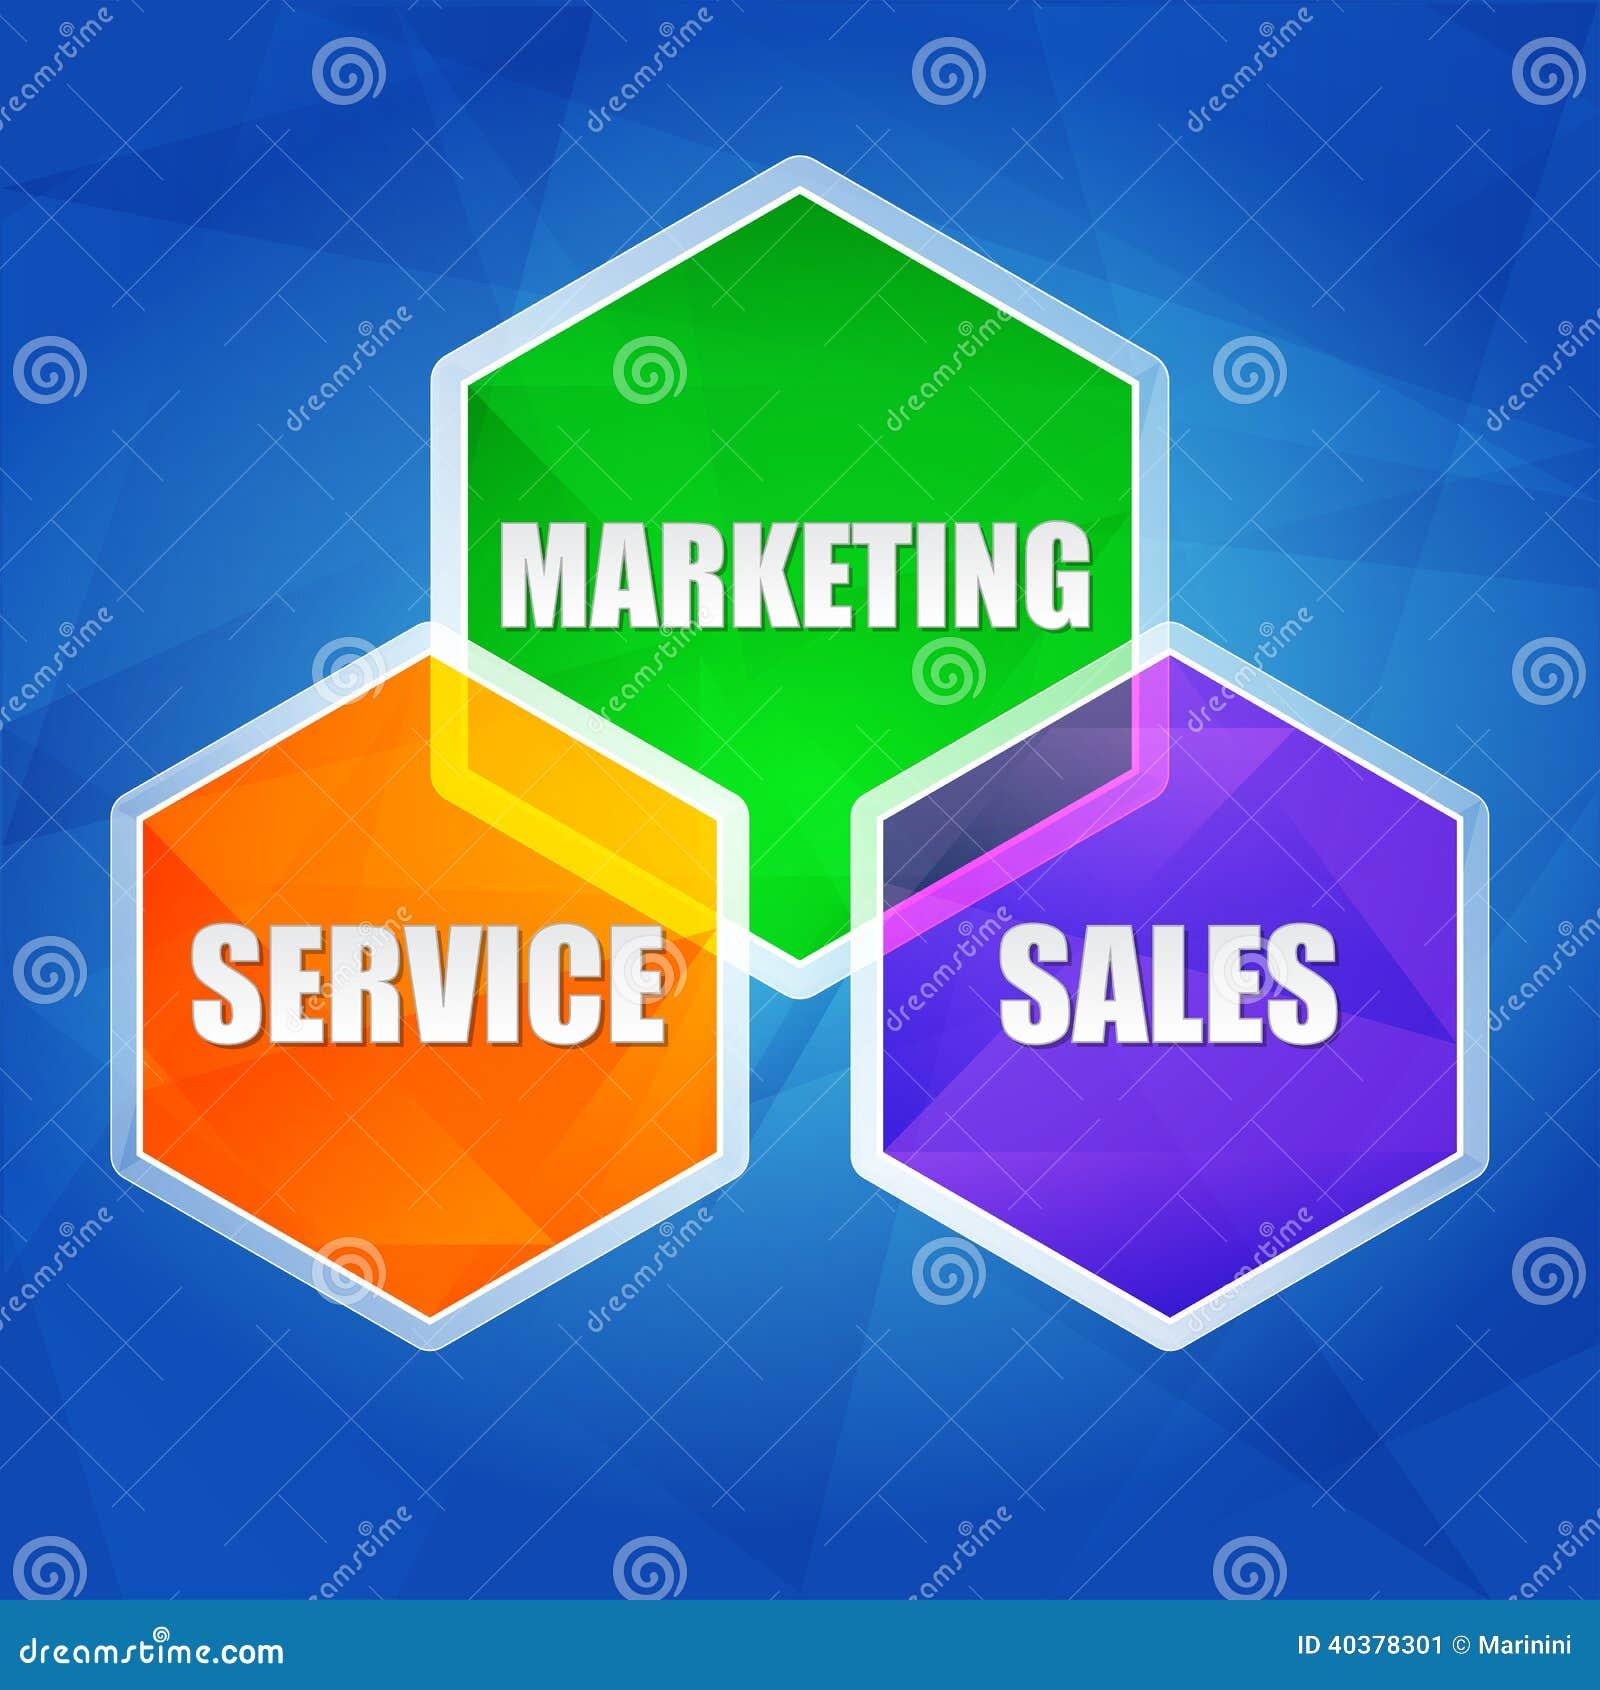 Marketing Sales: Service, Marketing, Sales In Hexagons, Flat Design Stock